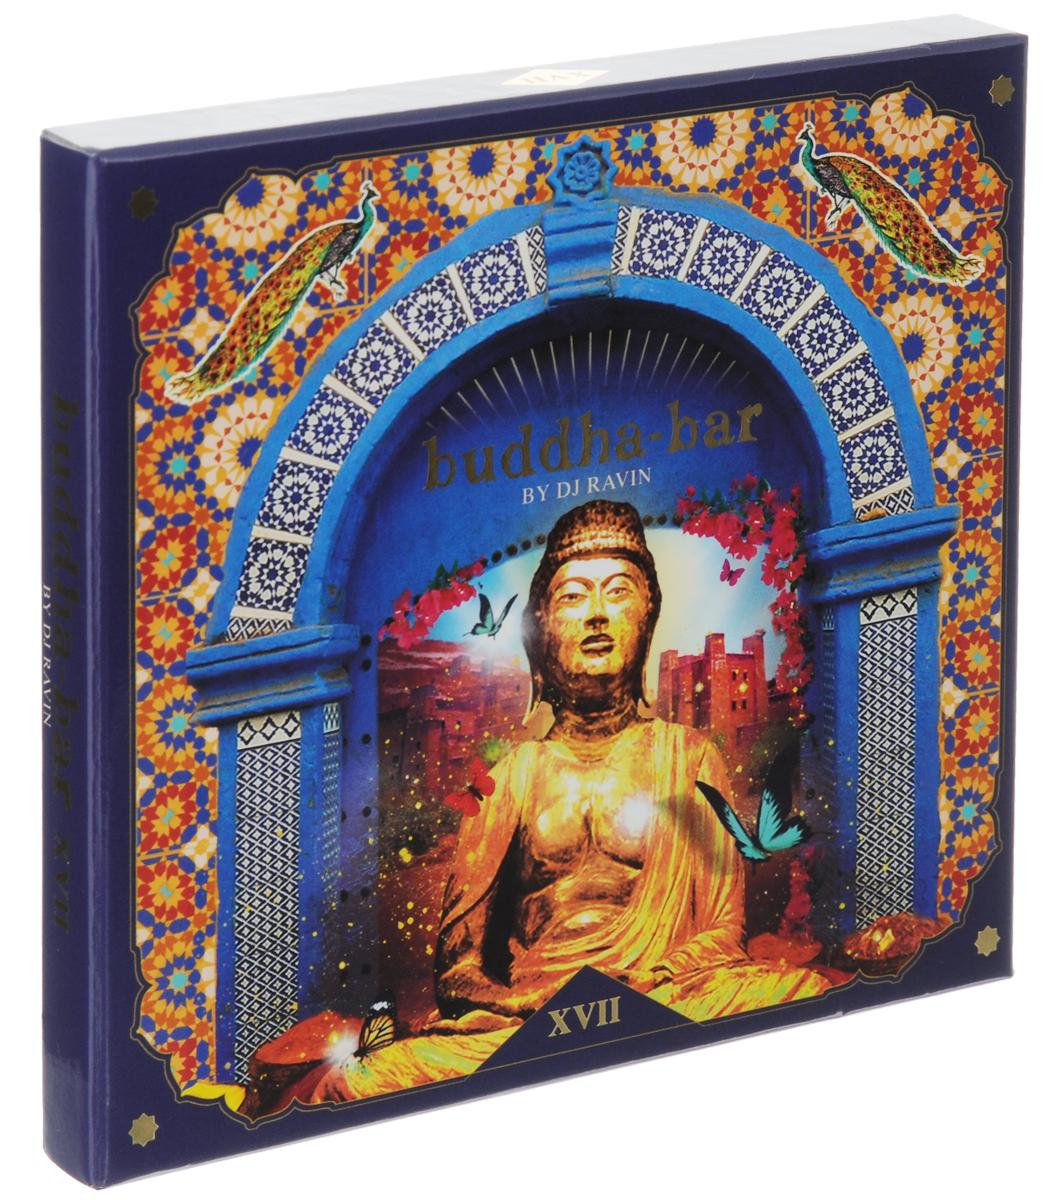 Buddha-Bar Vol. 17 (2 CD)